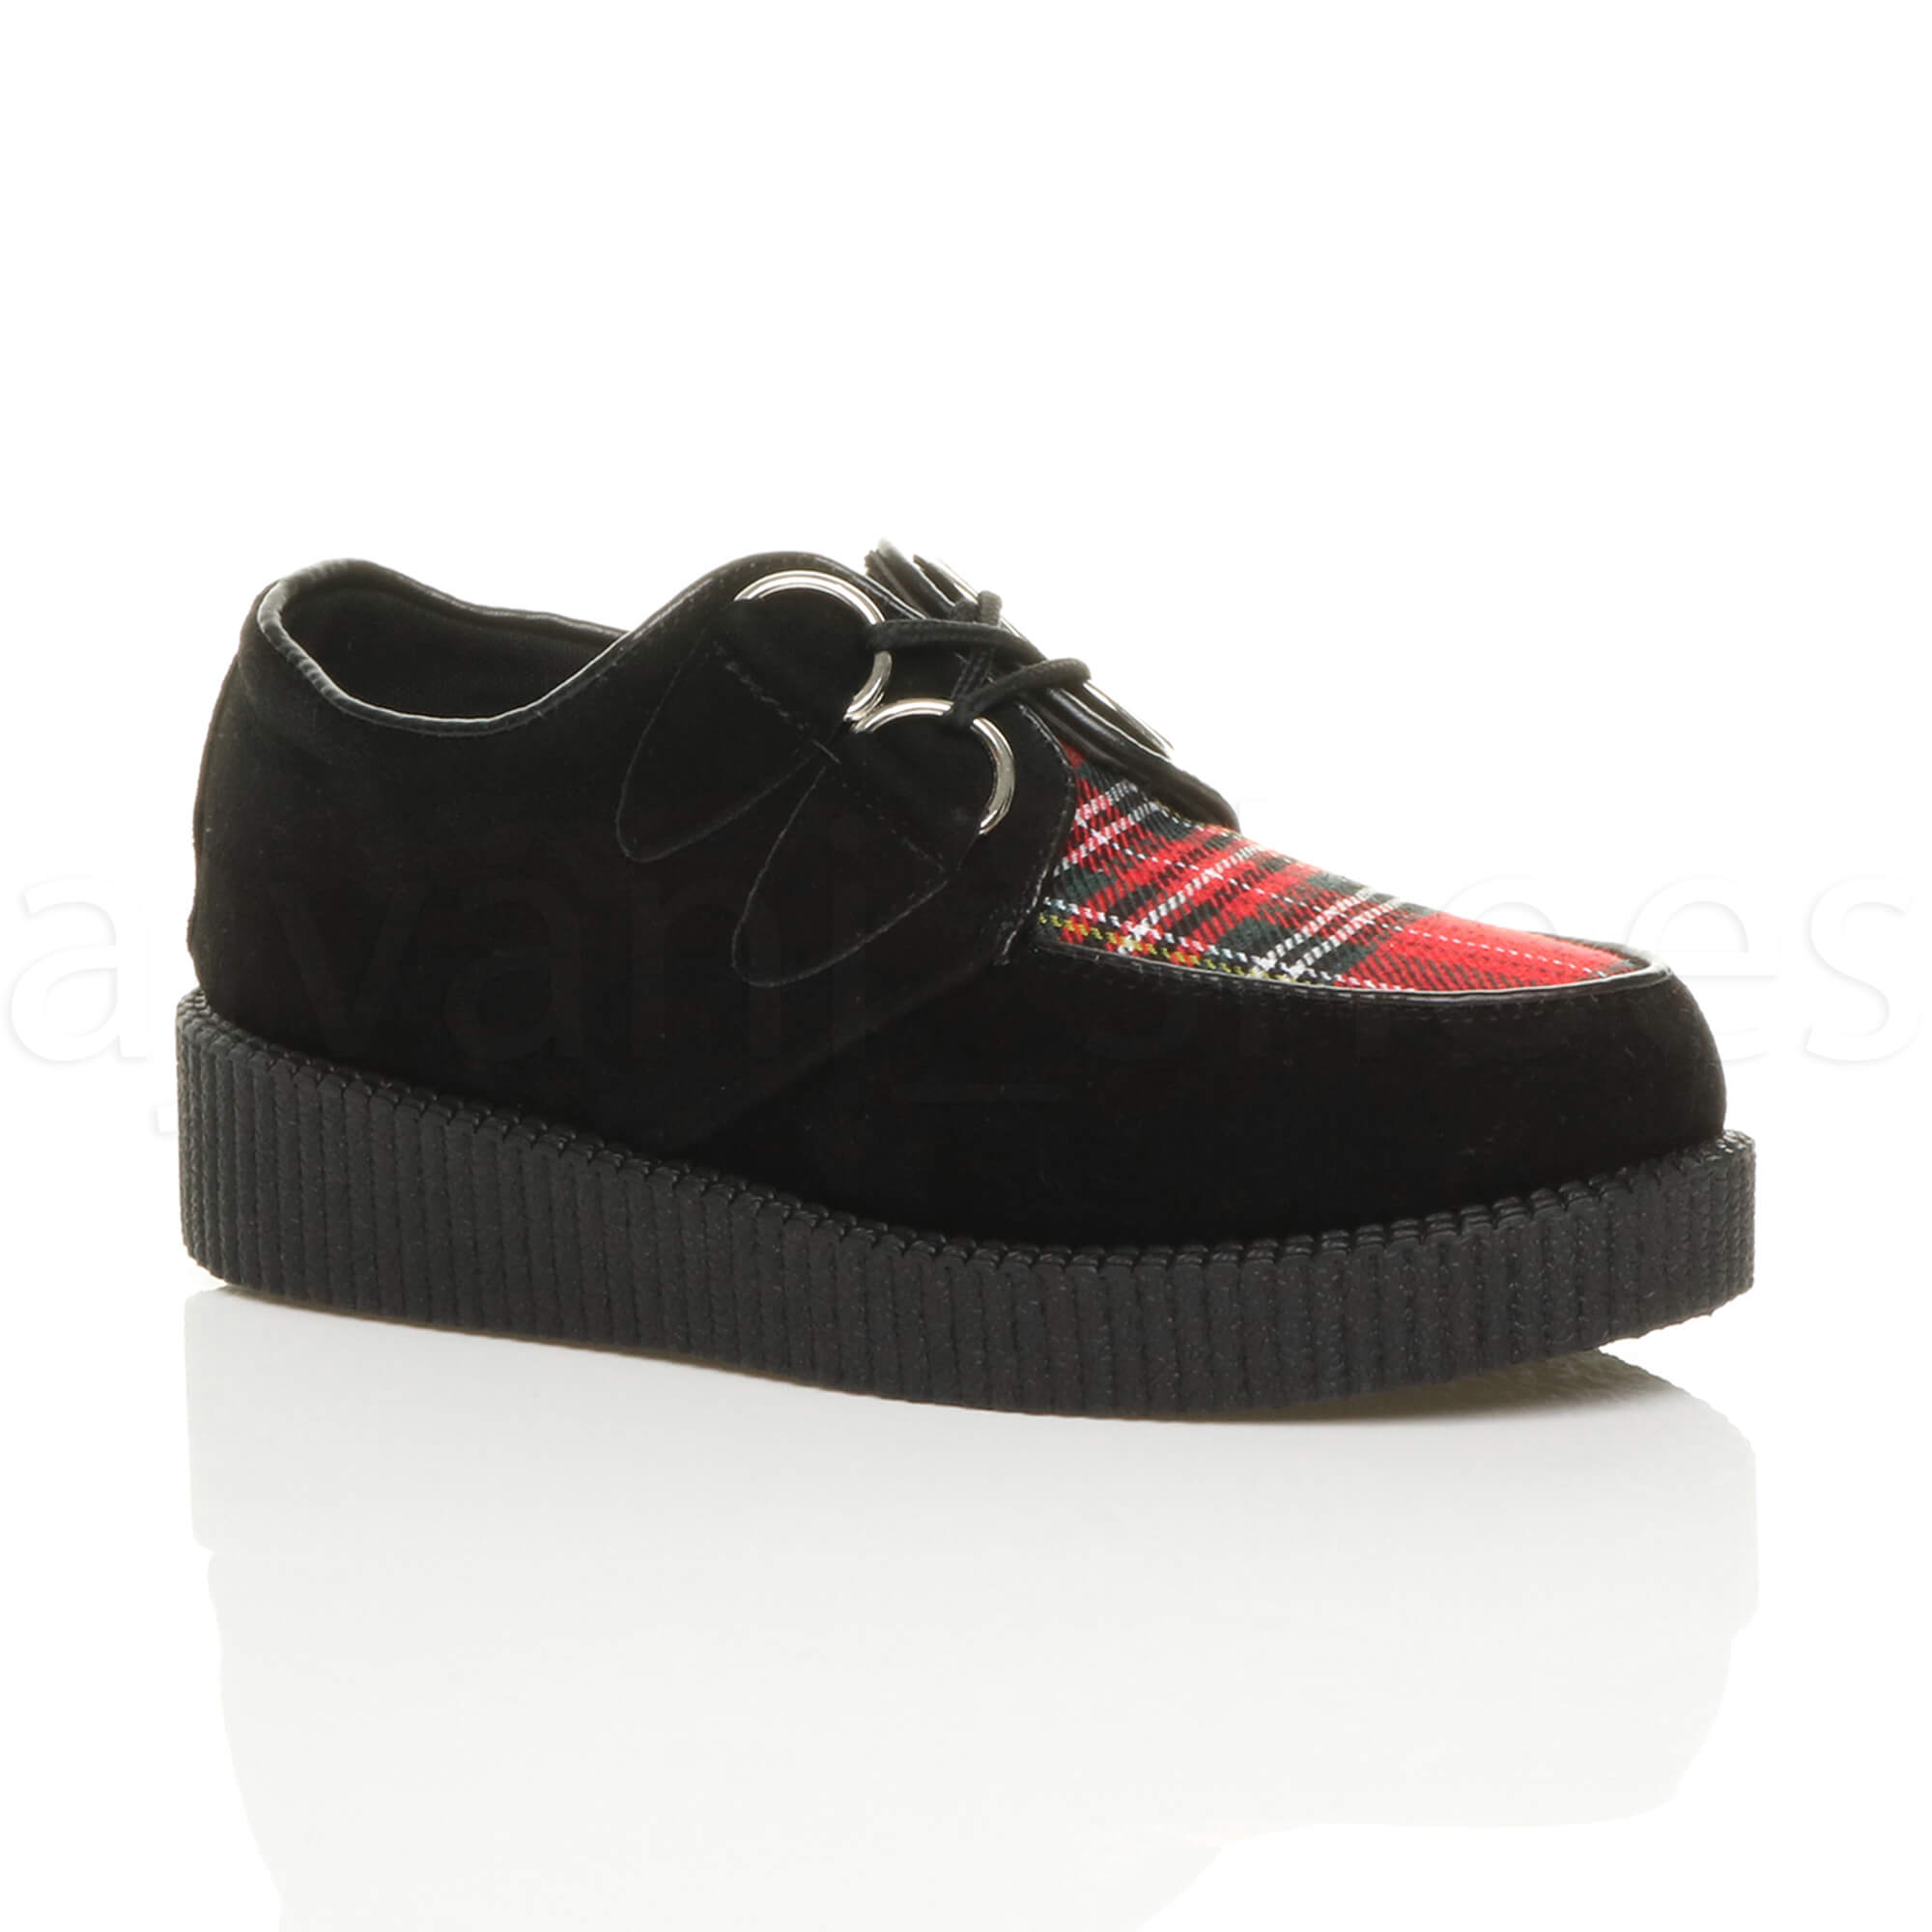 Para-Mujer-Damas-Plana-Plataforma-Cuna-lazada-Goth-Punk-Creepers-Zapatos-Botas-Talla